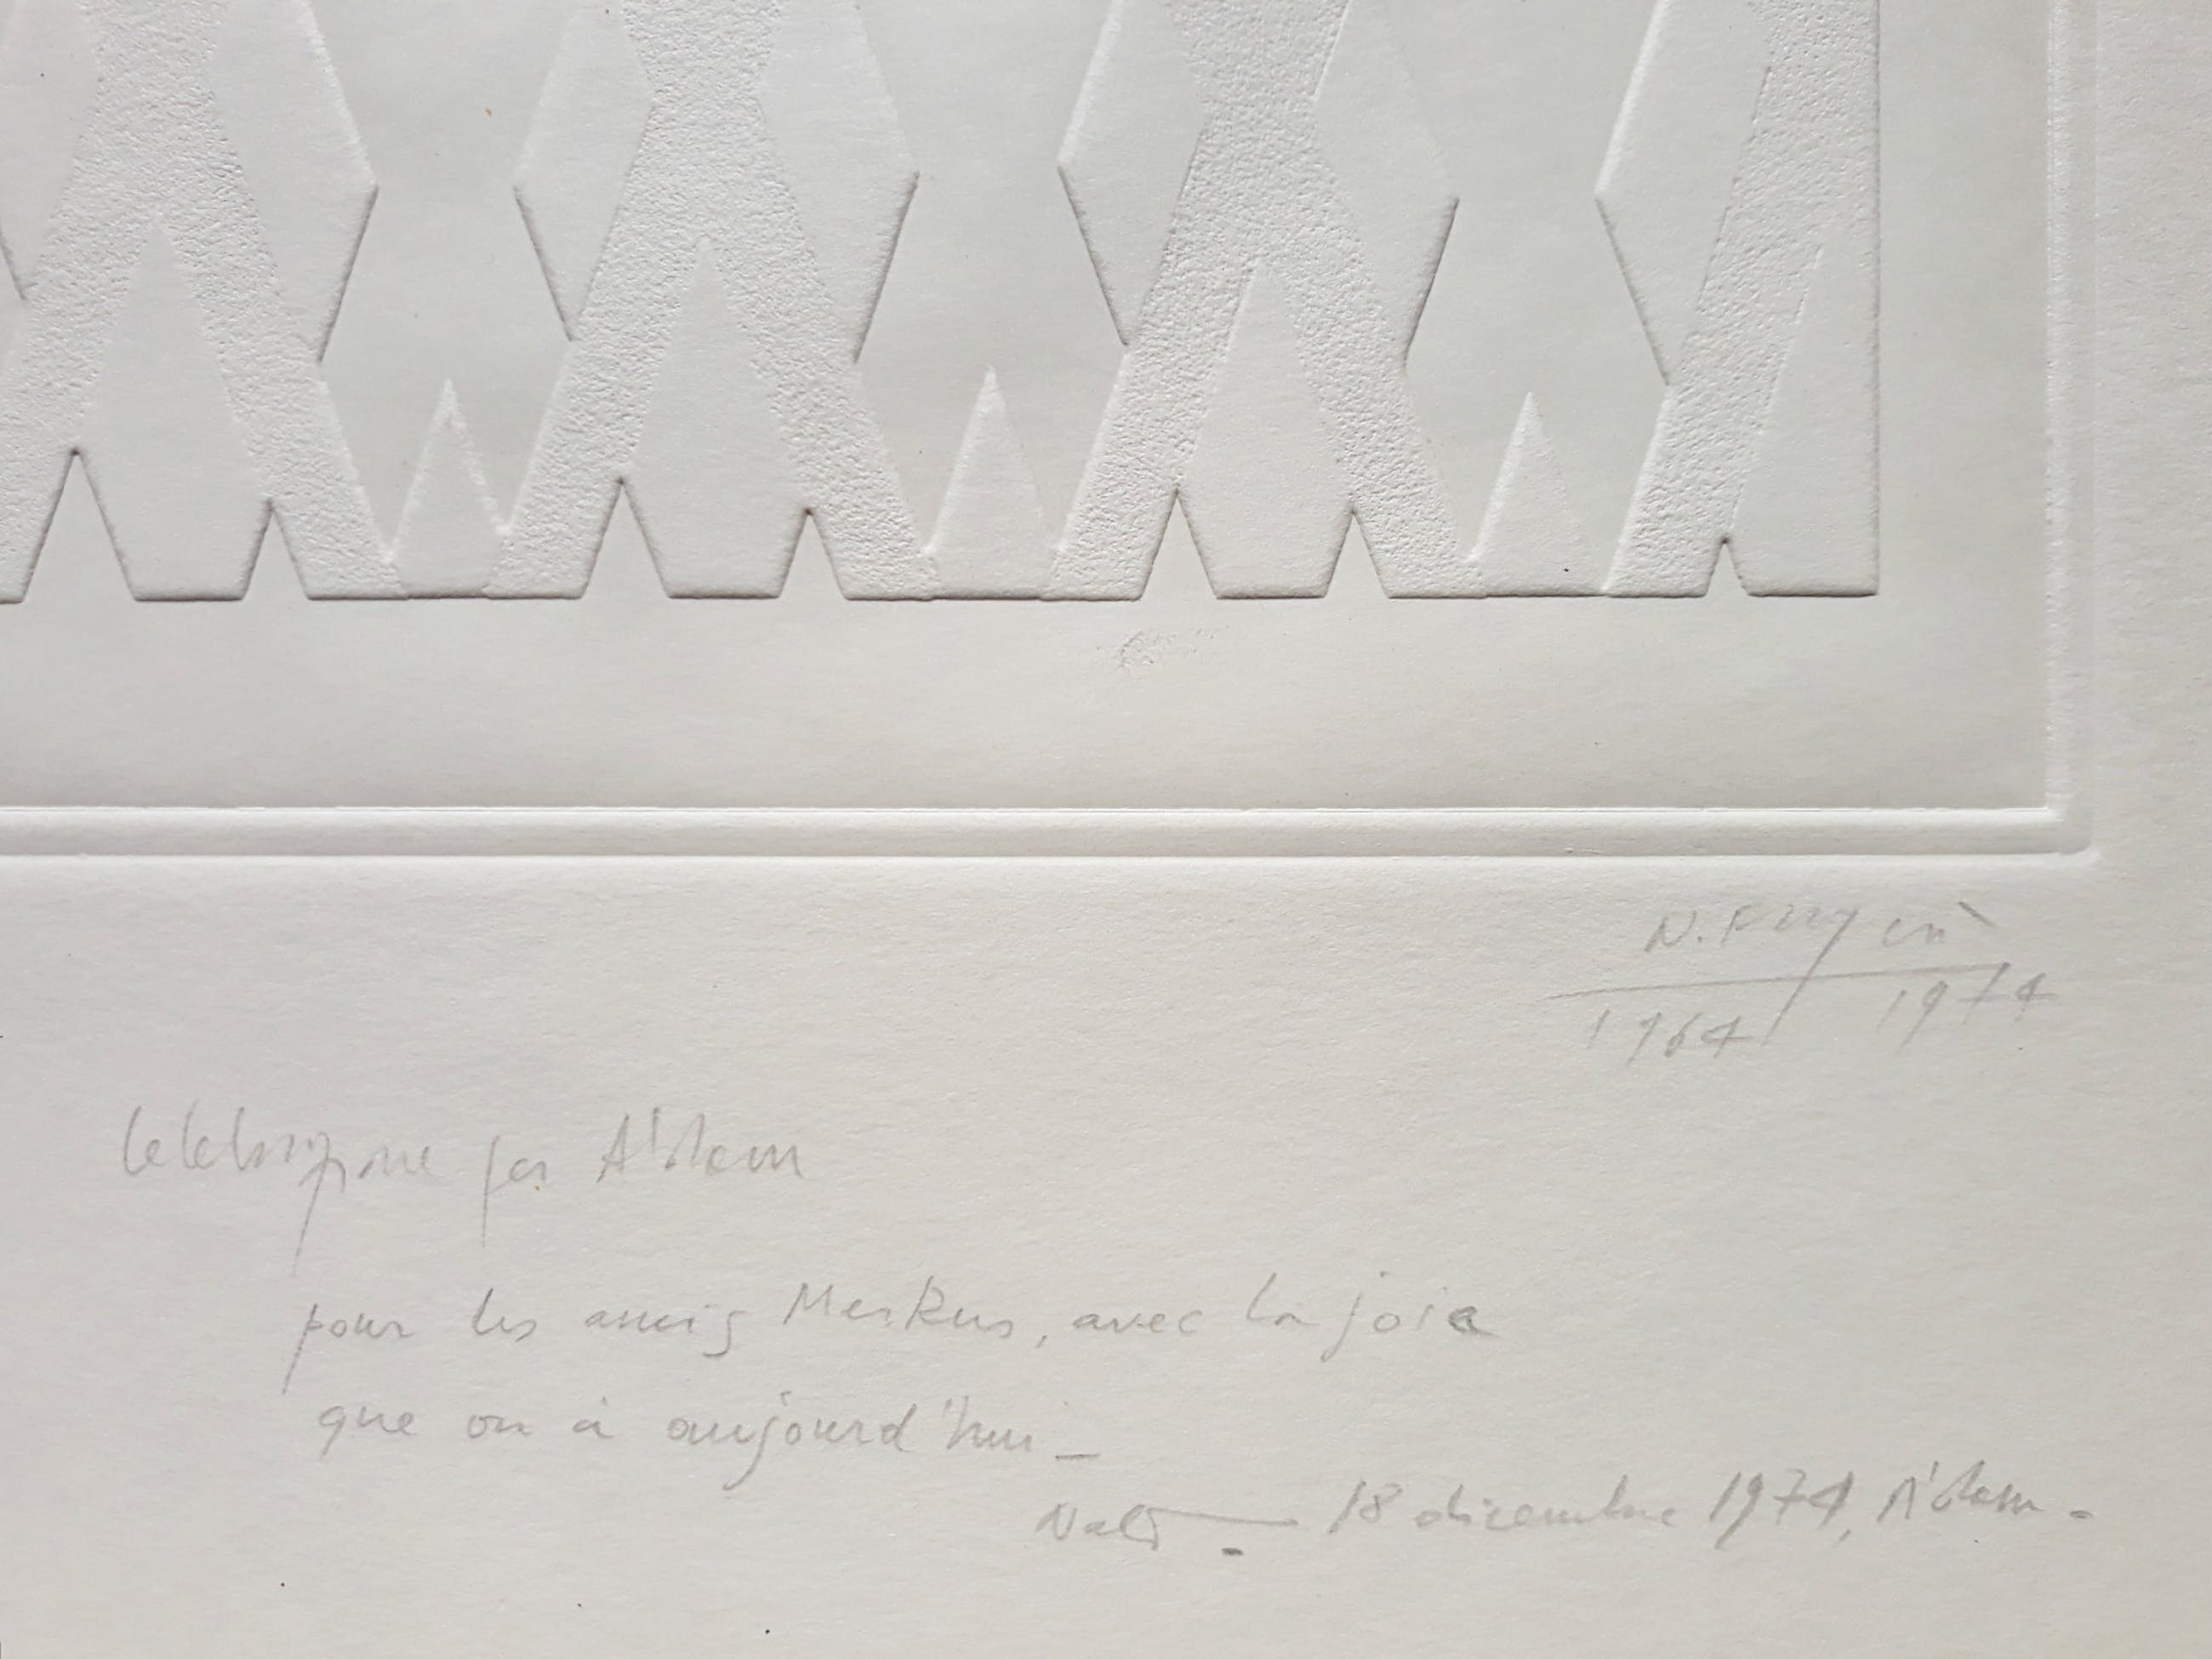 Nato Frascà - Geometrisch abstract, preegdruk kopen? Bied vanaf 195!